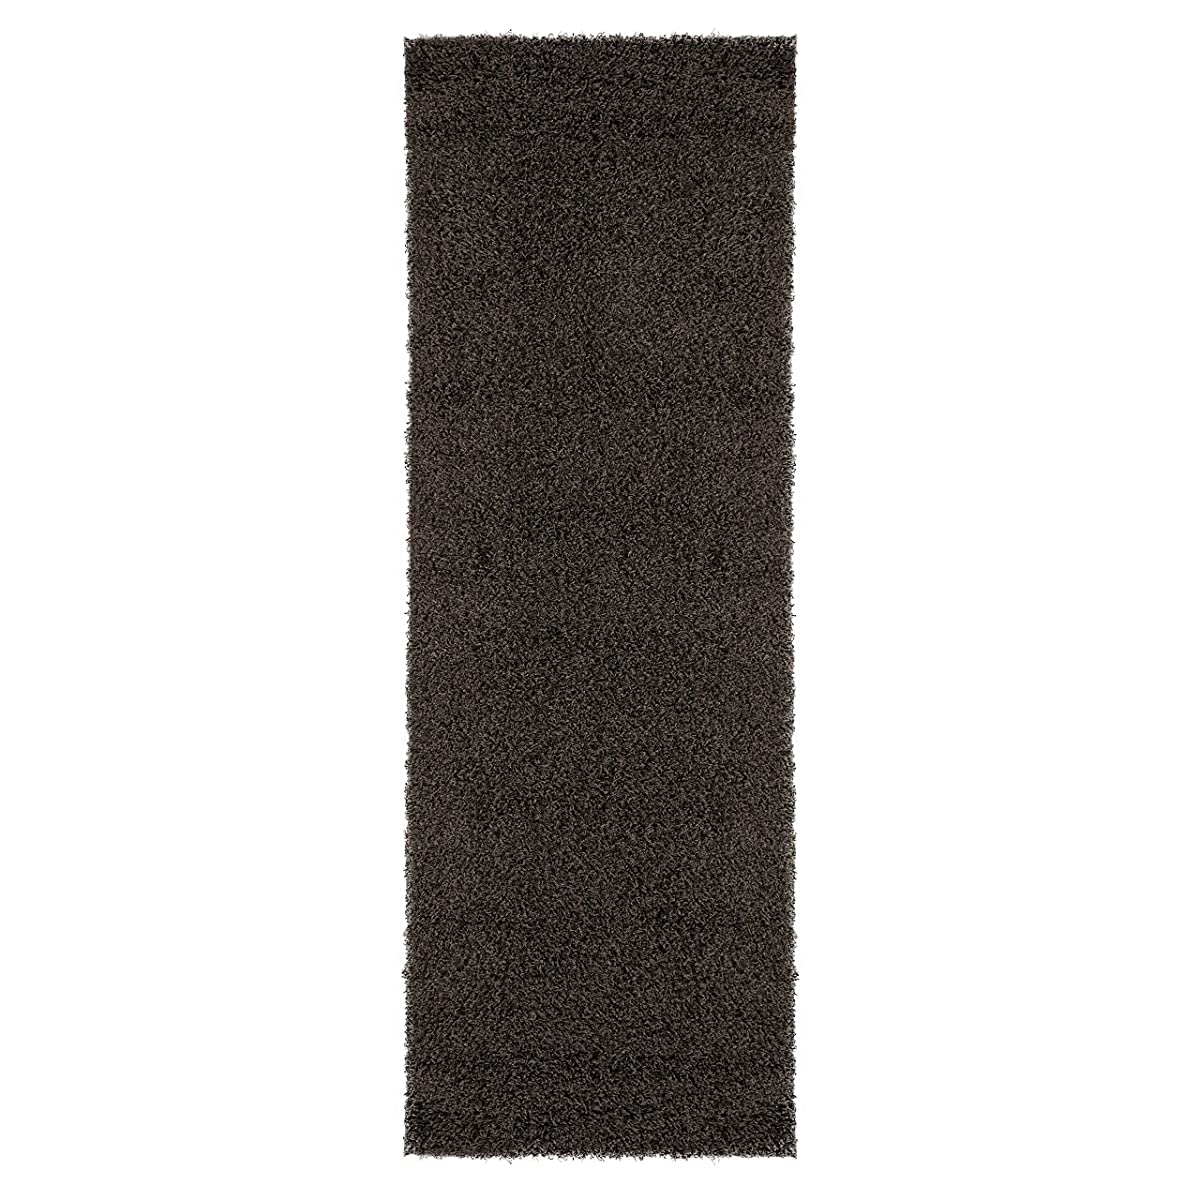 "Ottomanson Soft Cozy Color Solid Shag Runner Rug Contemporary Hallway and Kitchen Shag Runner Rug, Dark Gray, 27""L X 80""W"